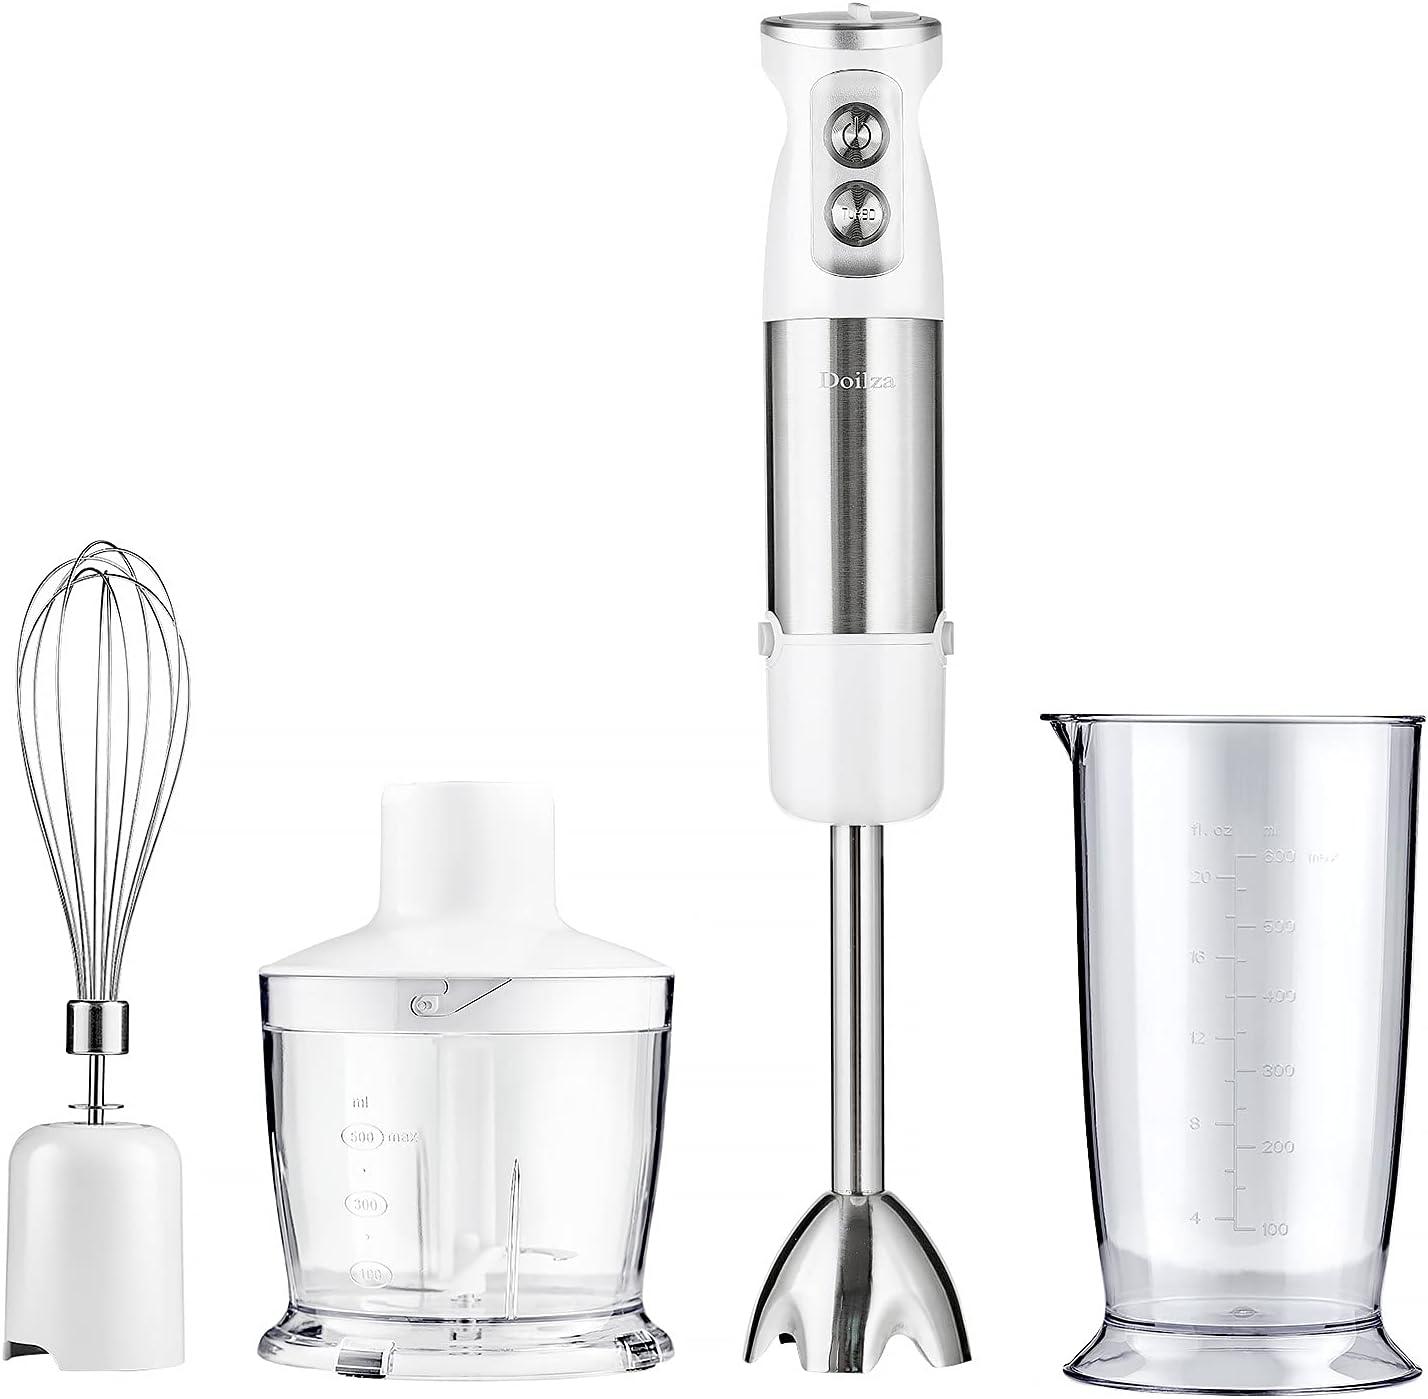 4-in-1 Immersion Hand Blender 500 Watt Variable Speed Motor Stick Blender For Kitchen WithTurbo For Egg Beater Coffee Frother Whisk BPA-Free white